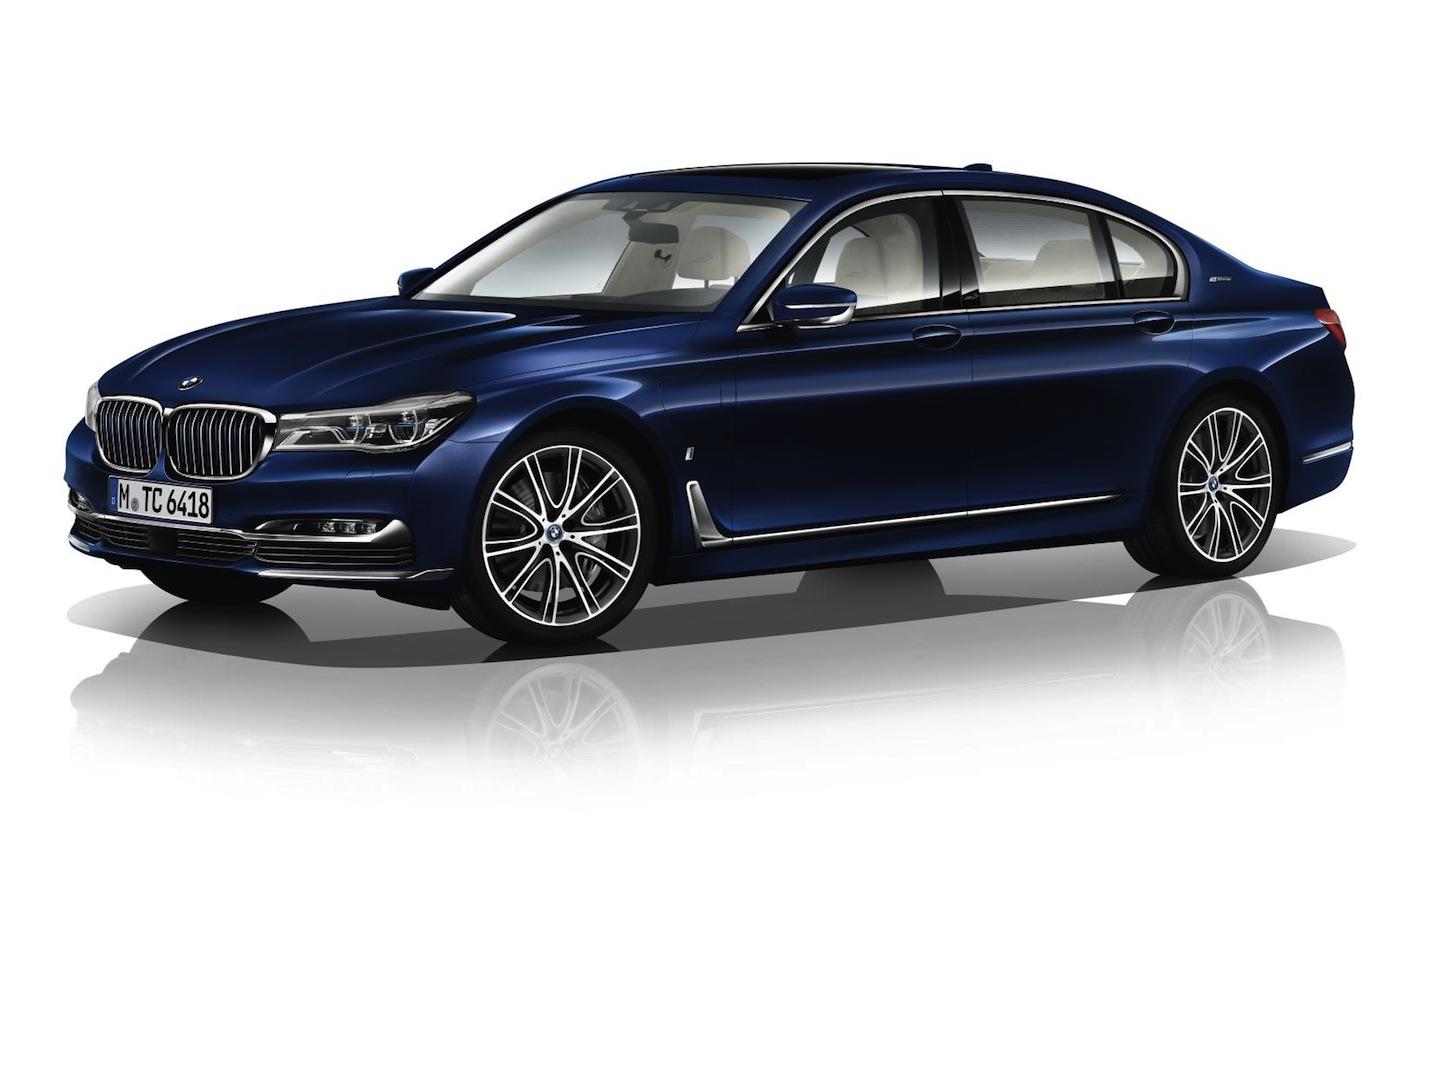 2017 BMW 7 Series Centennial Editions Supercar